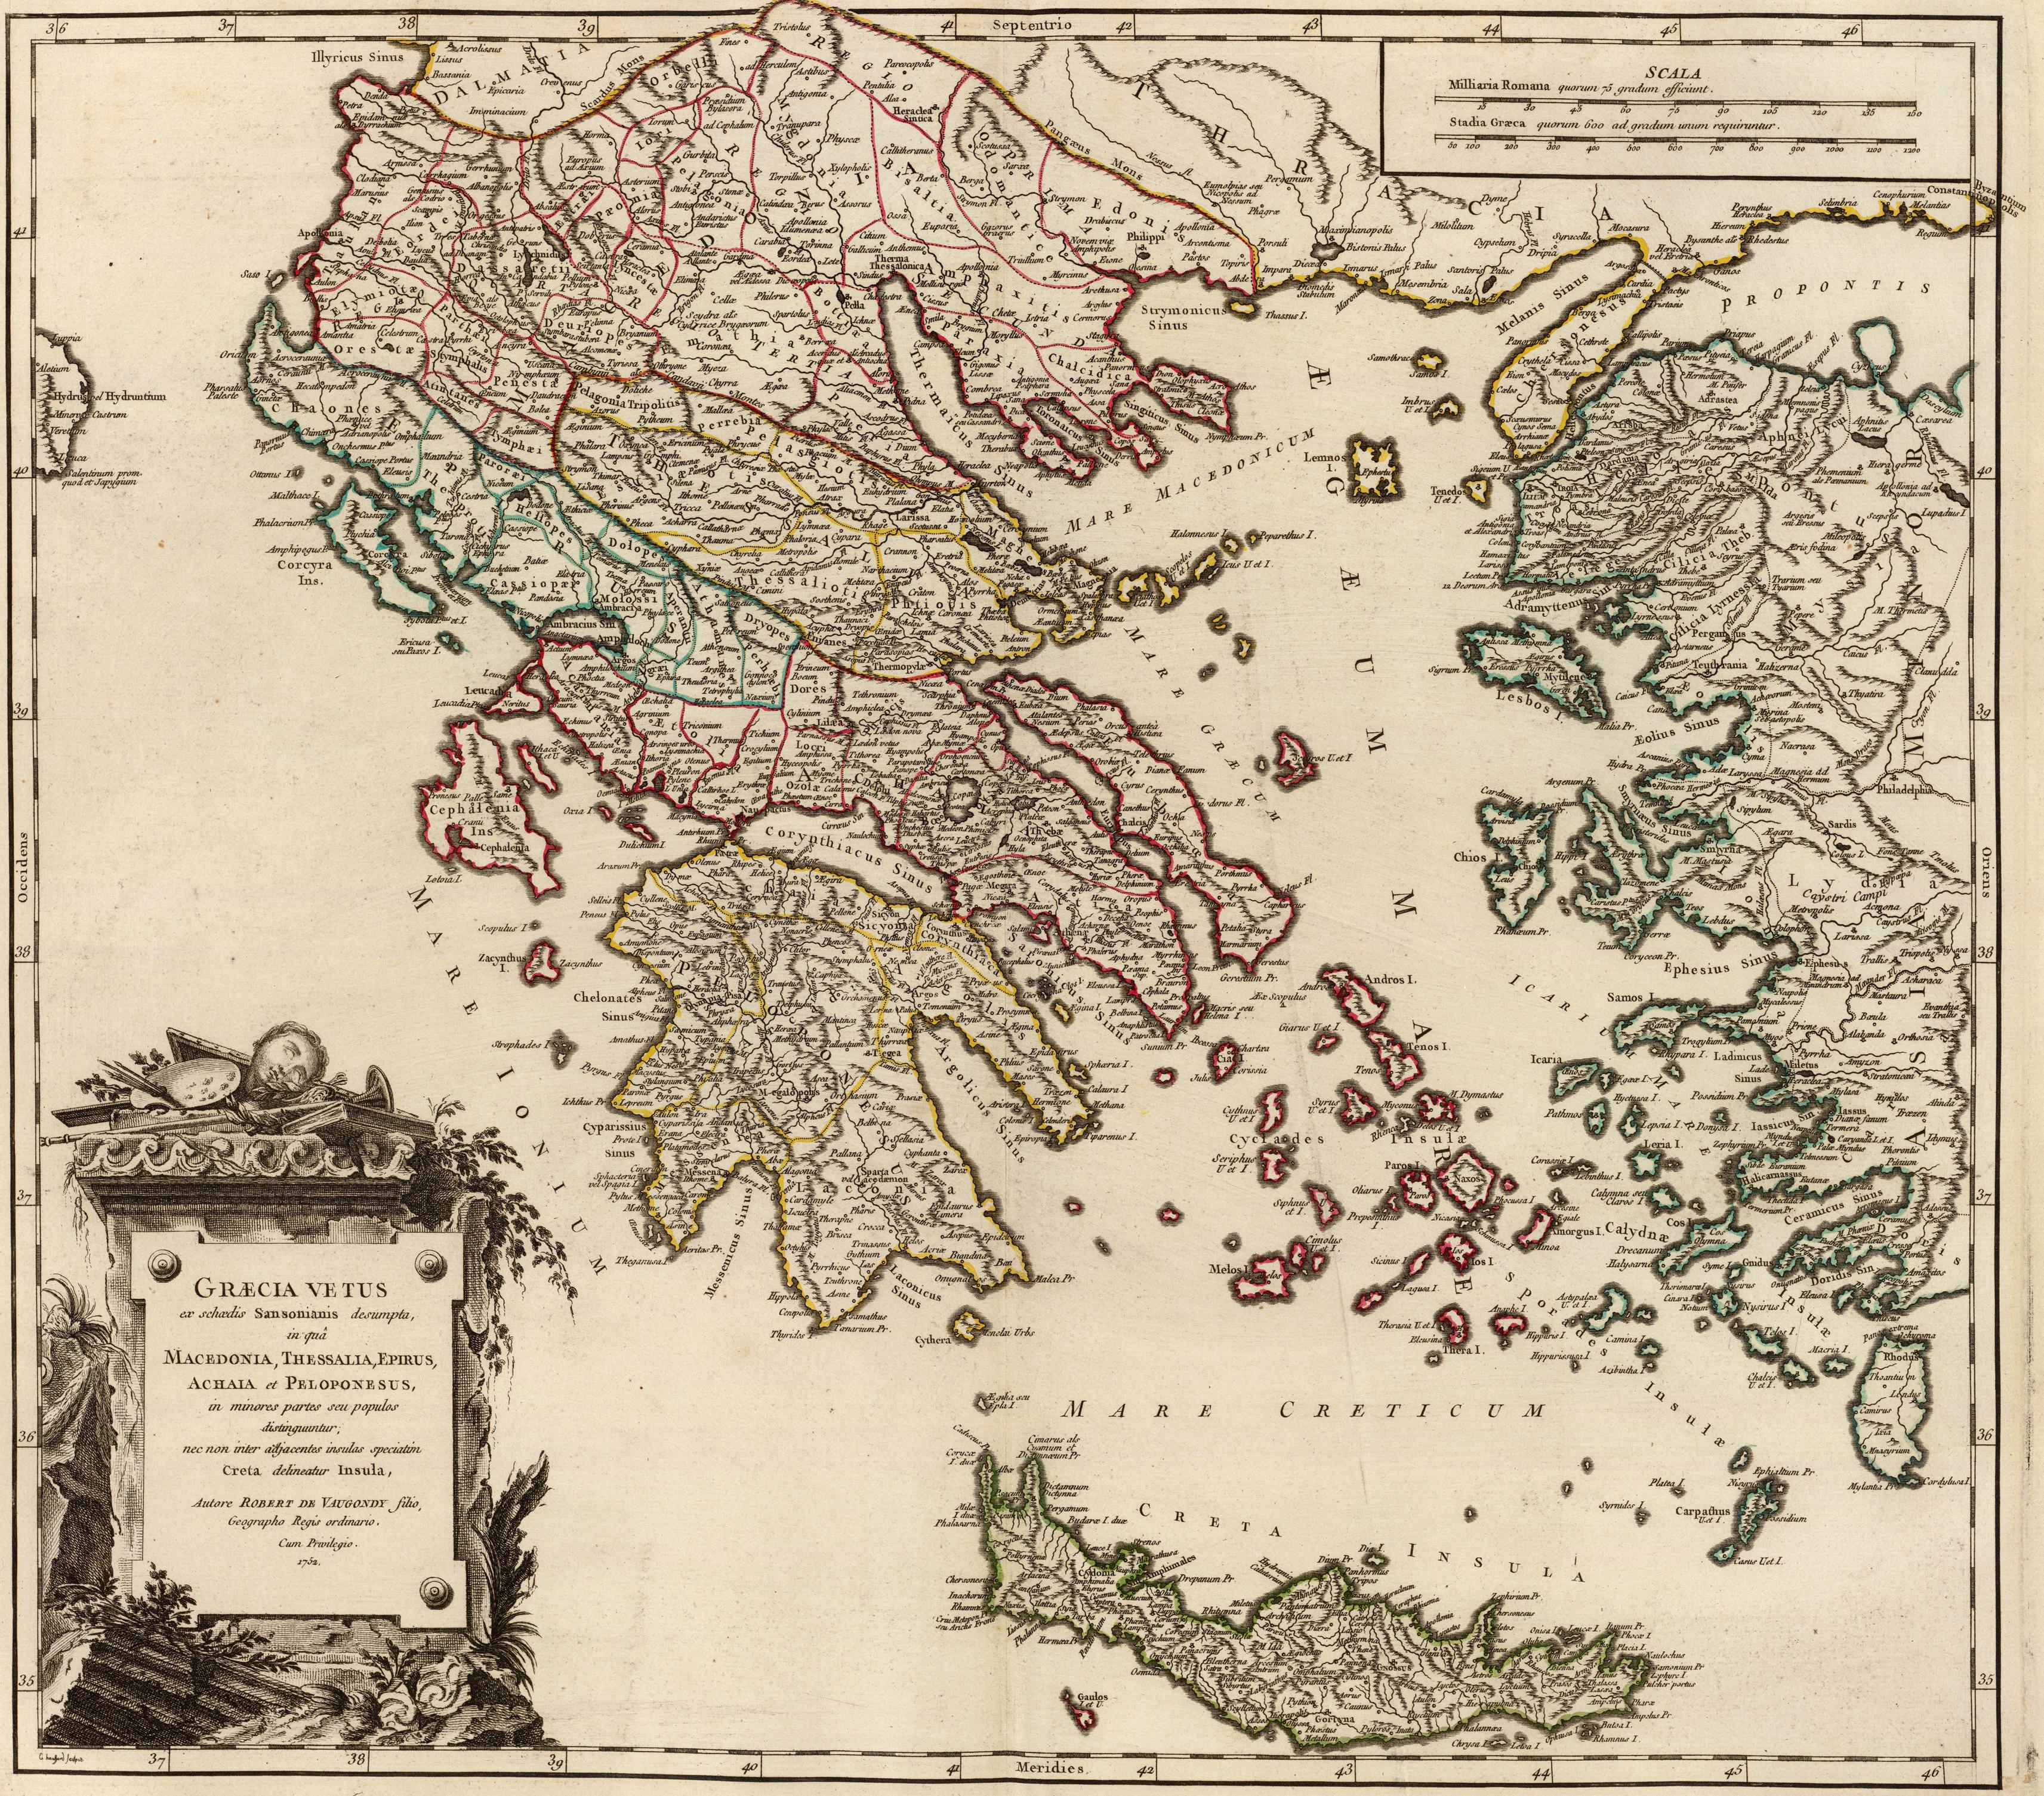 filegraecia vetus map of ancient greece. filegraecia vetus map of ancient greece  wikimedia commons